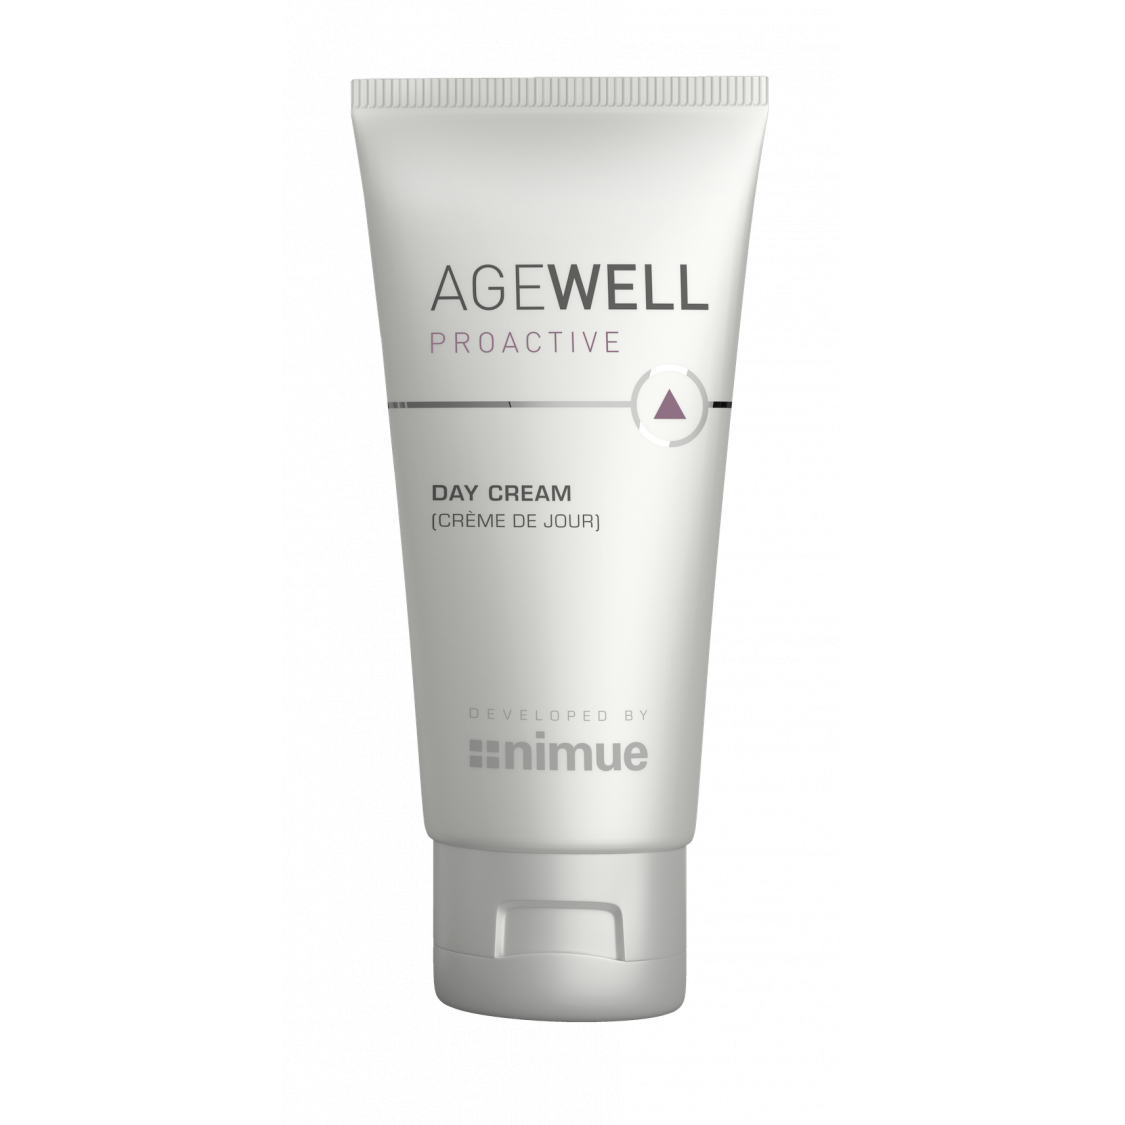 Agewell - Proactive Day Cream 20's 50ml